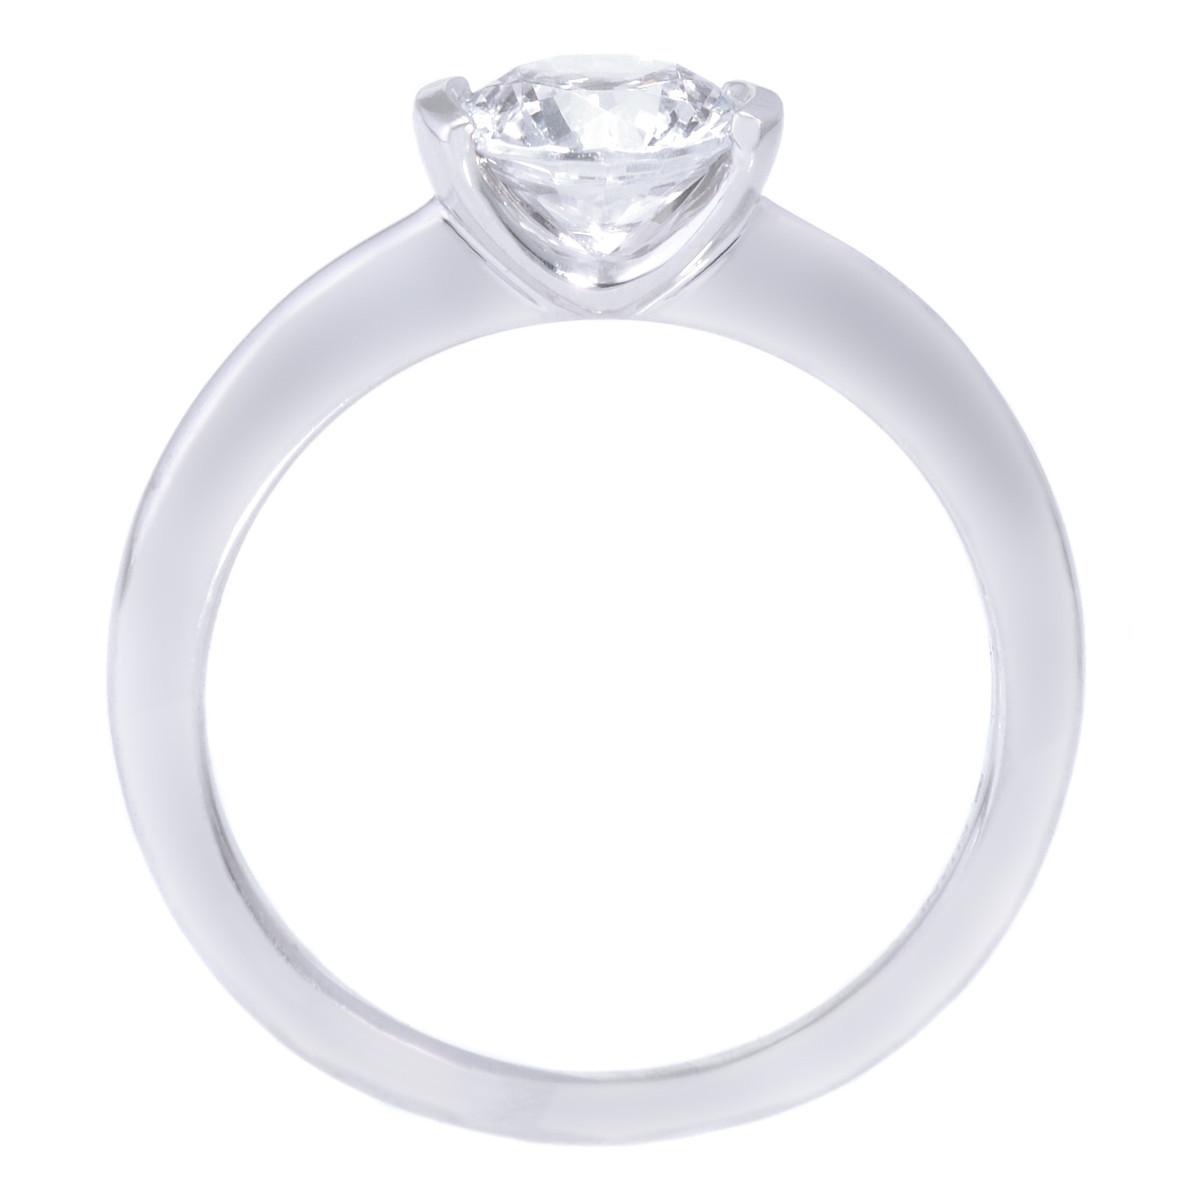 18K White Gold Modern Solitaire Semi-Bezel-Set Diamond Engagement Ring by Ritani